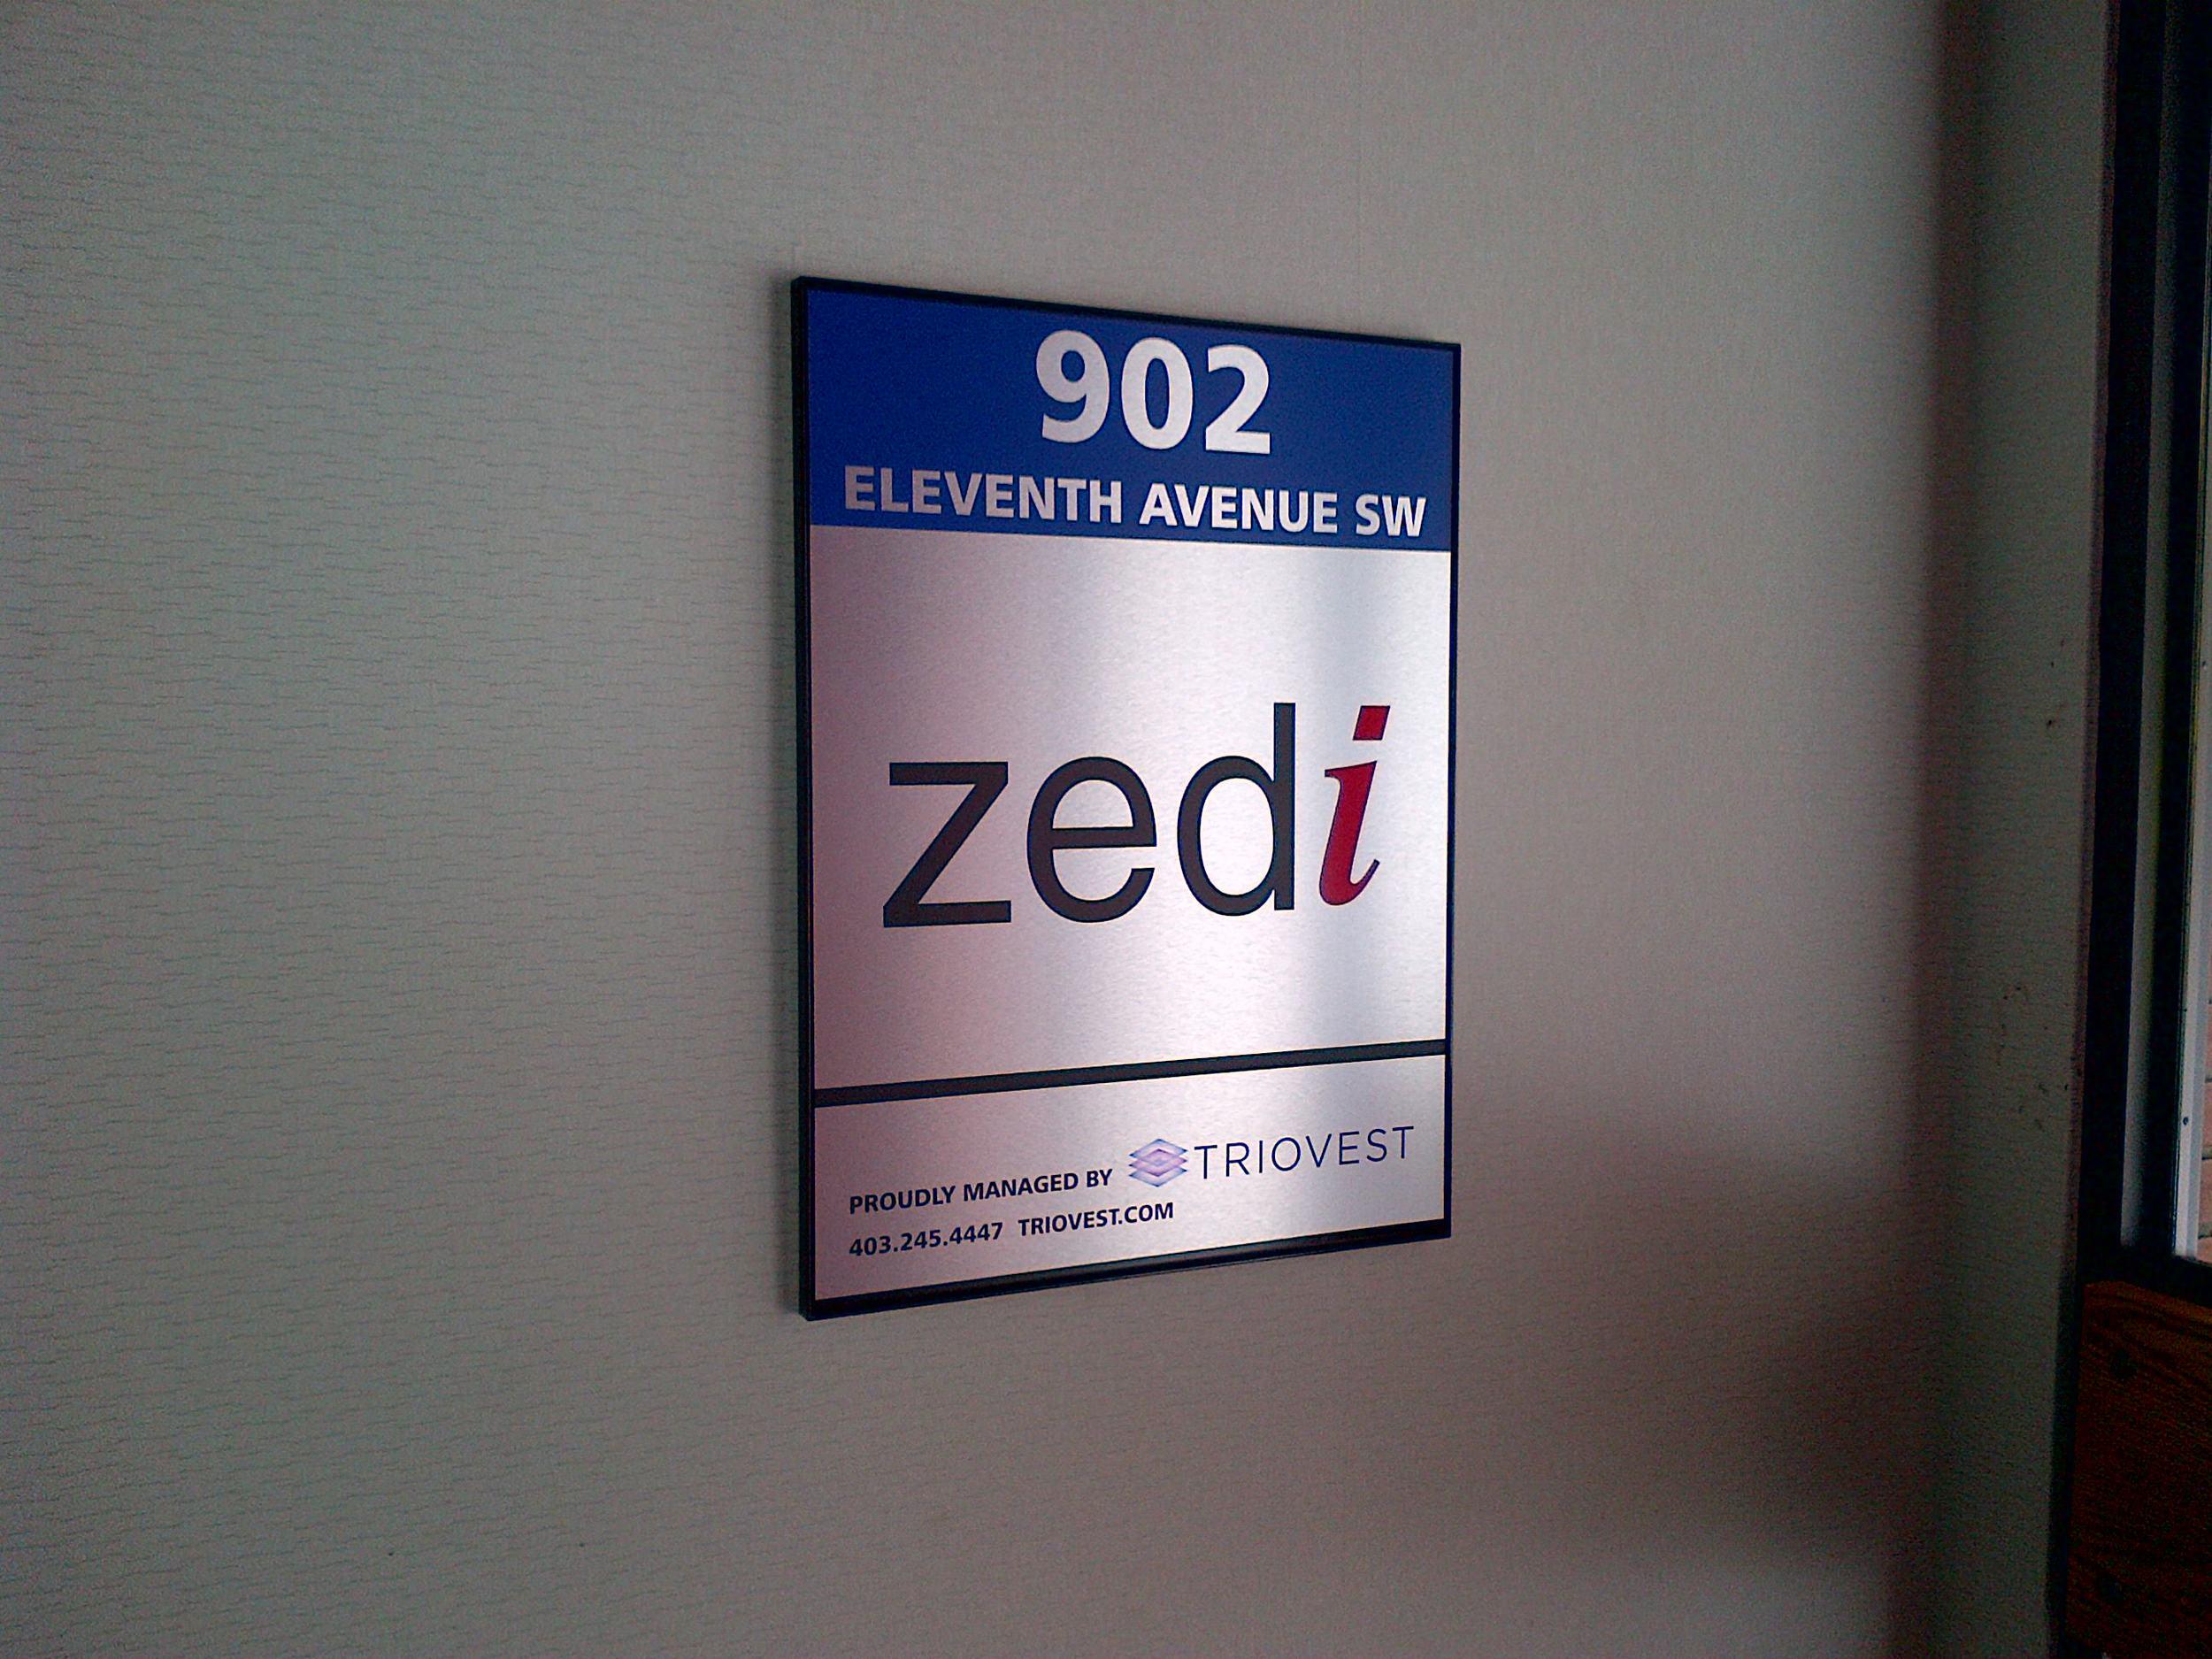 902 11 Ave Directory.jpg